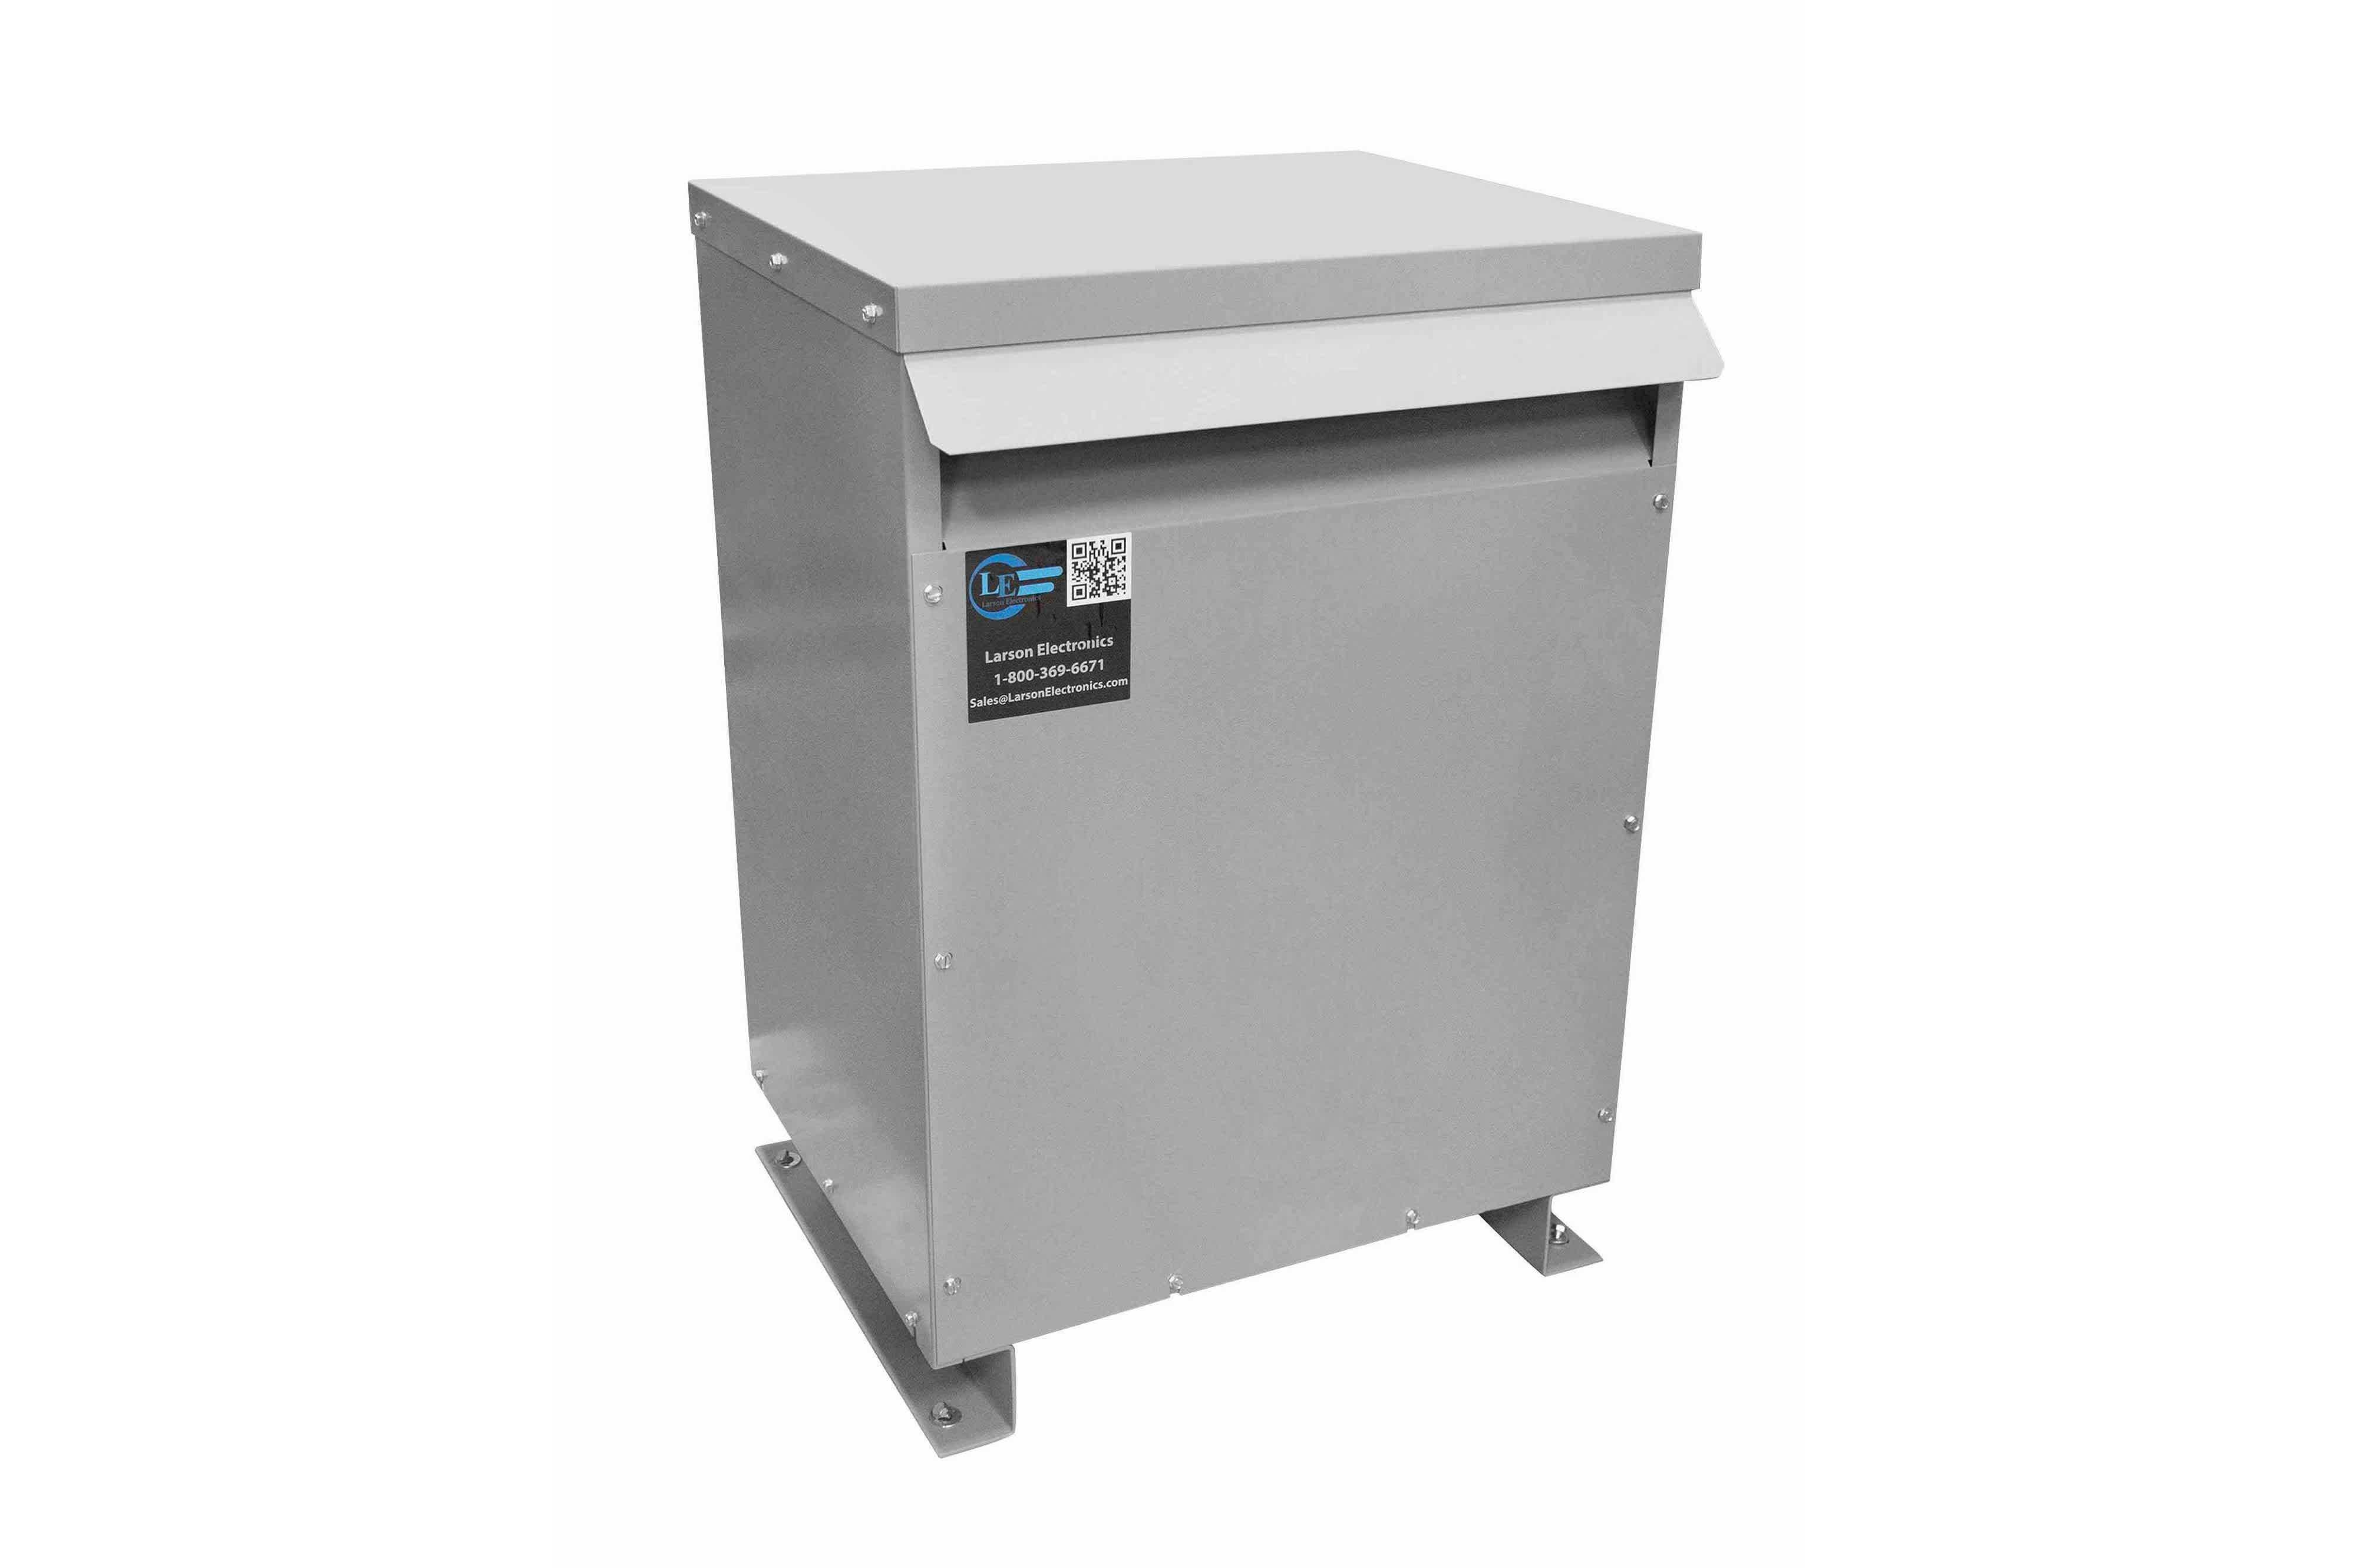 38 kVA 3PH Isolation Transformer, 240V Wye Primary, 415Y/240 Wye-N Secondary, N3R, Ventilated, 60 Hz